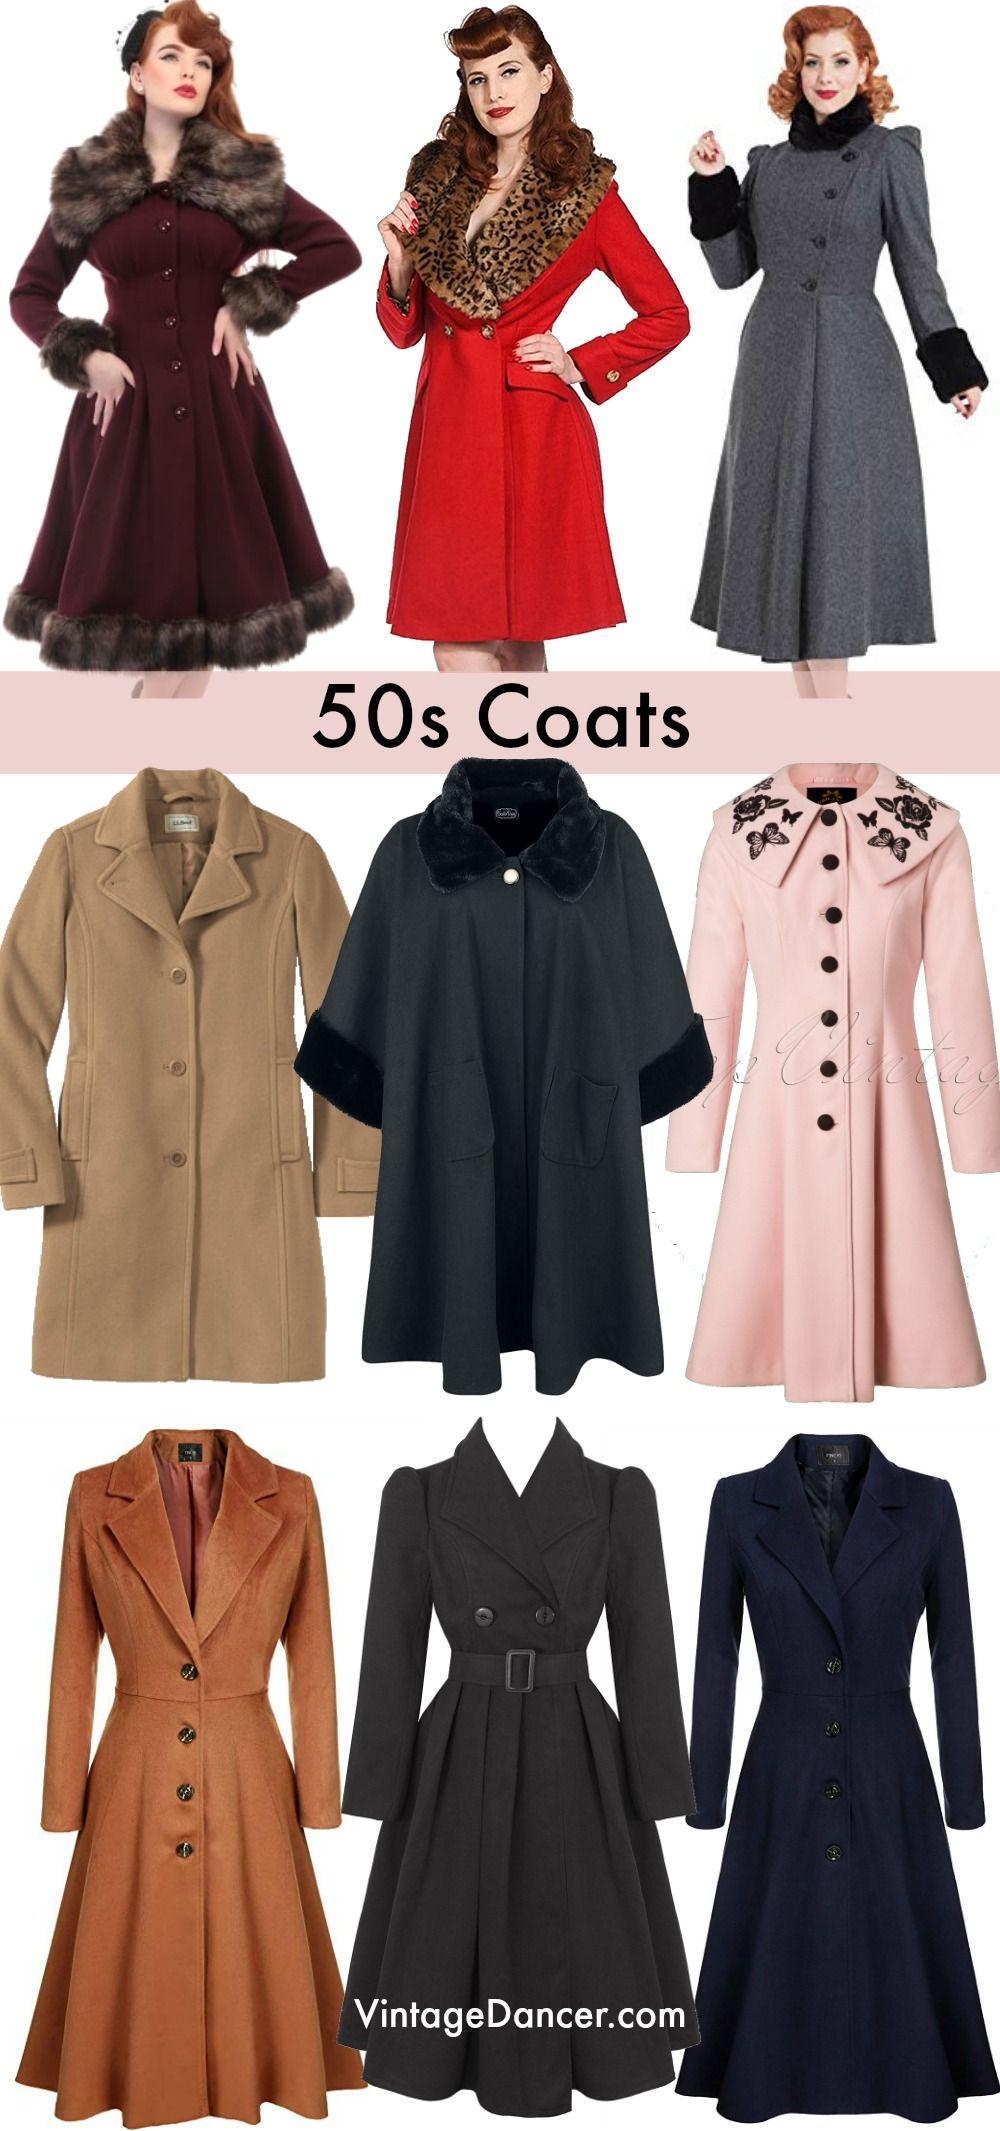 1950s Jackets and Coats #vintagefashion1950s